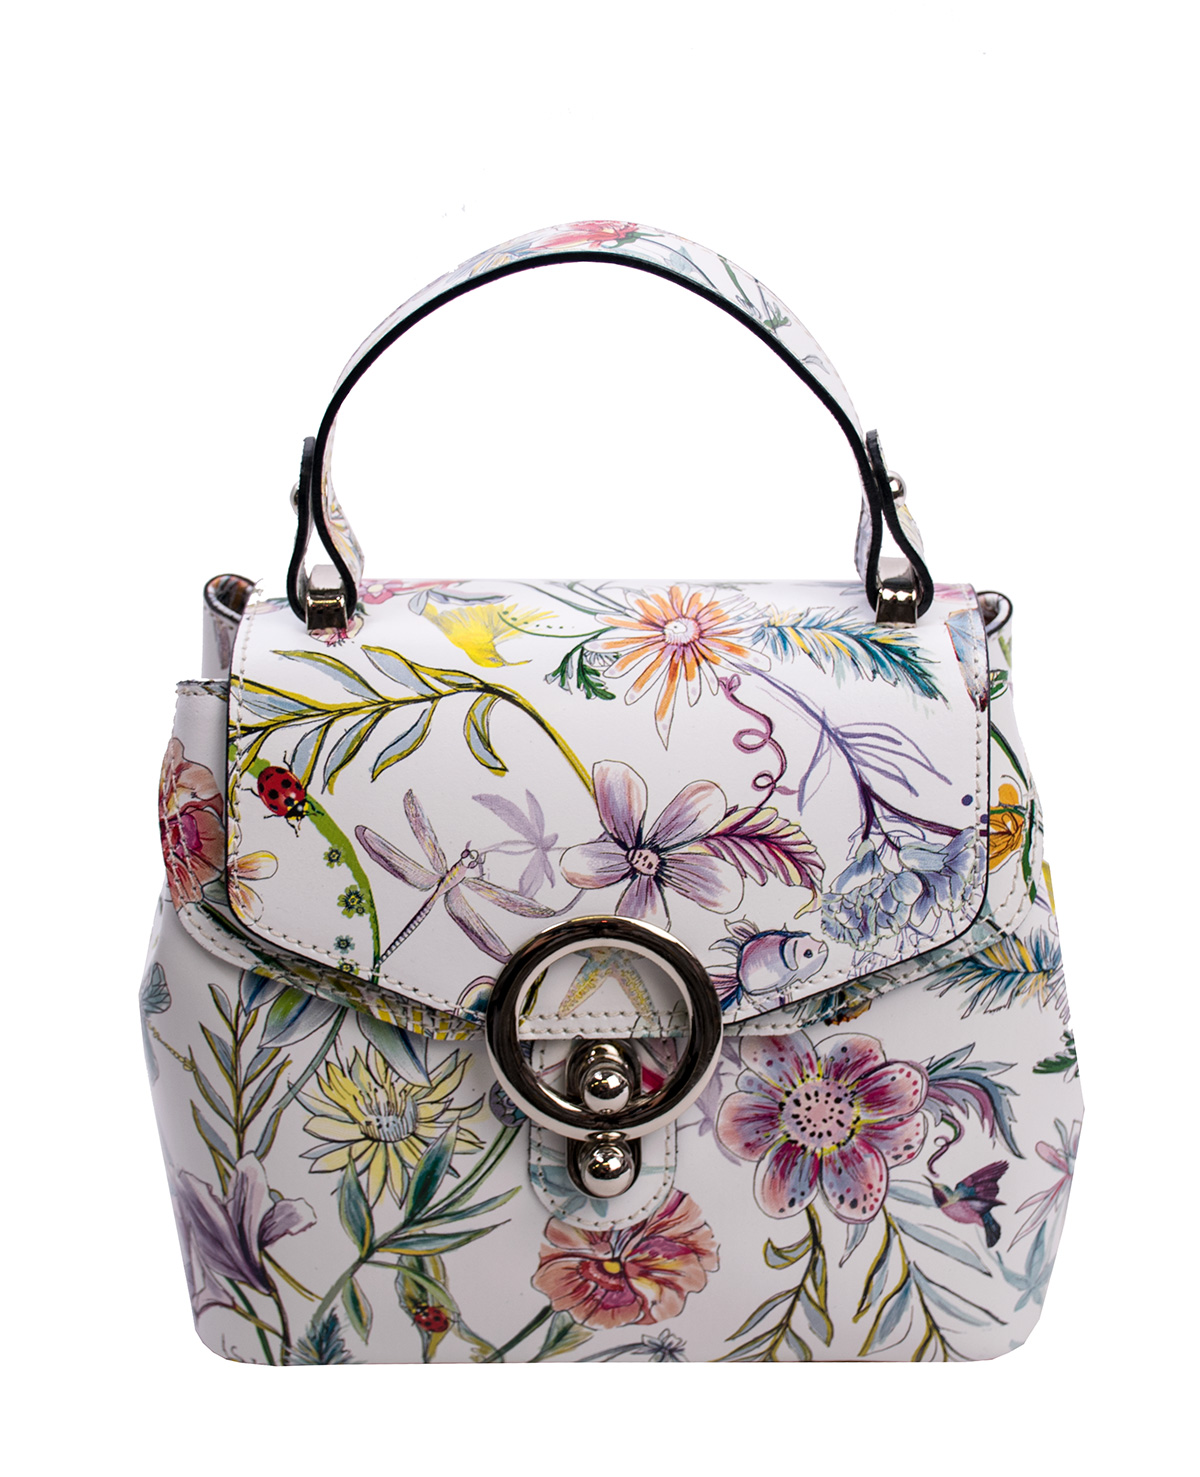 Bags and more Arabella Fehér virágos Női Bőr Kézitáska